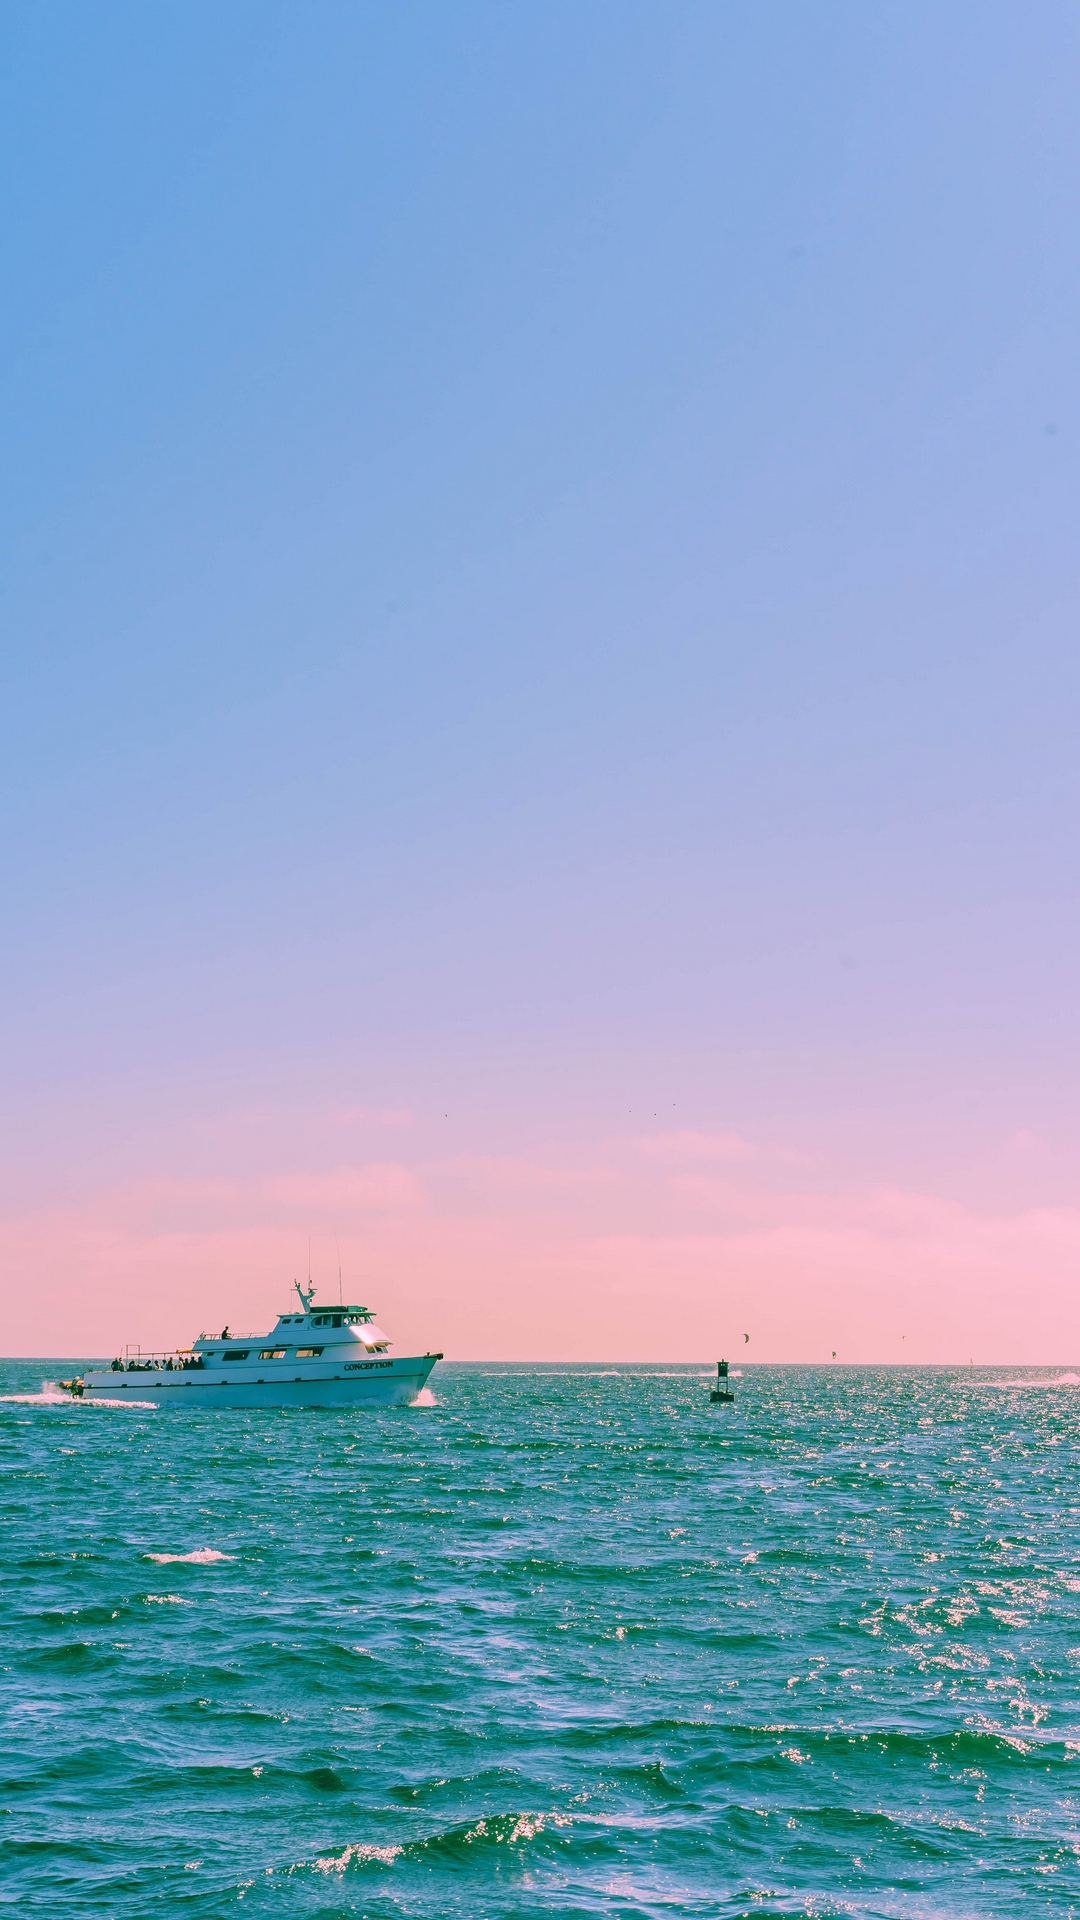 Ship Sea Wallpaper 1080x1920